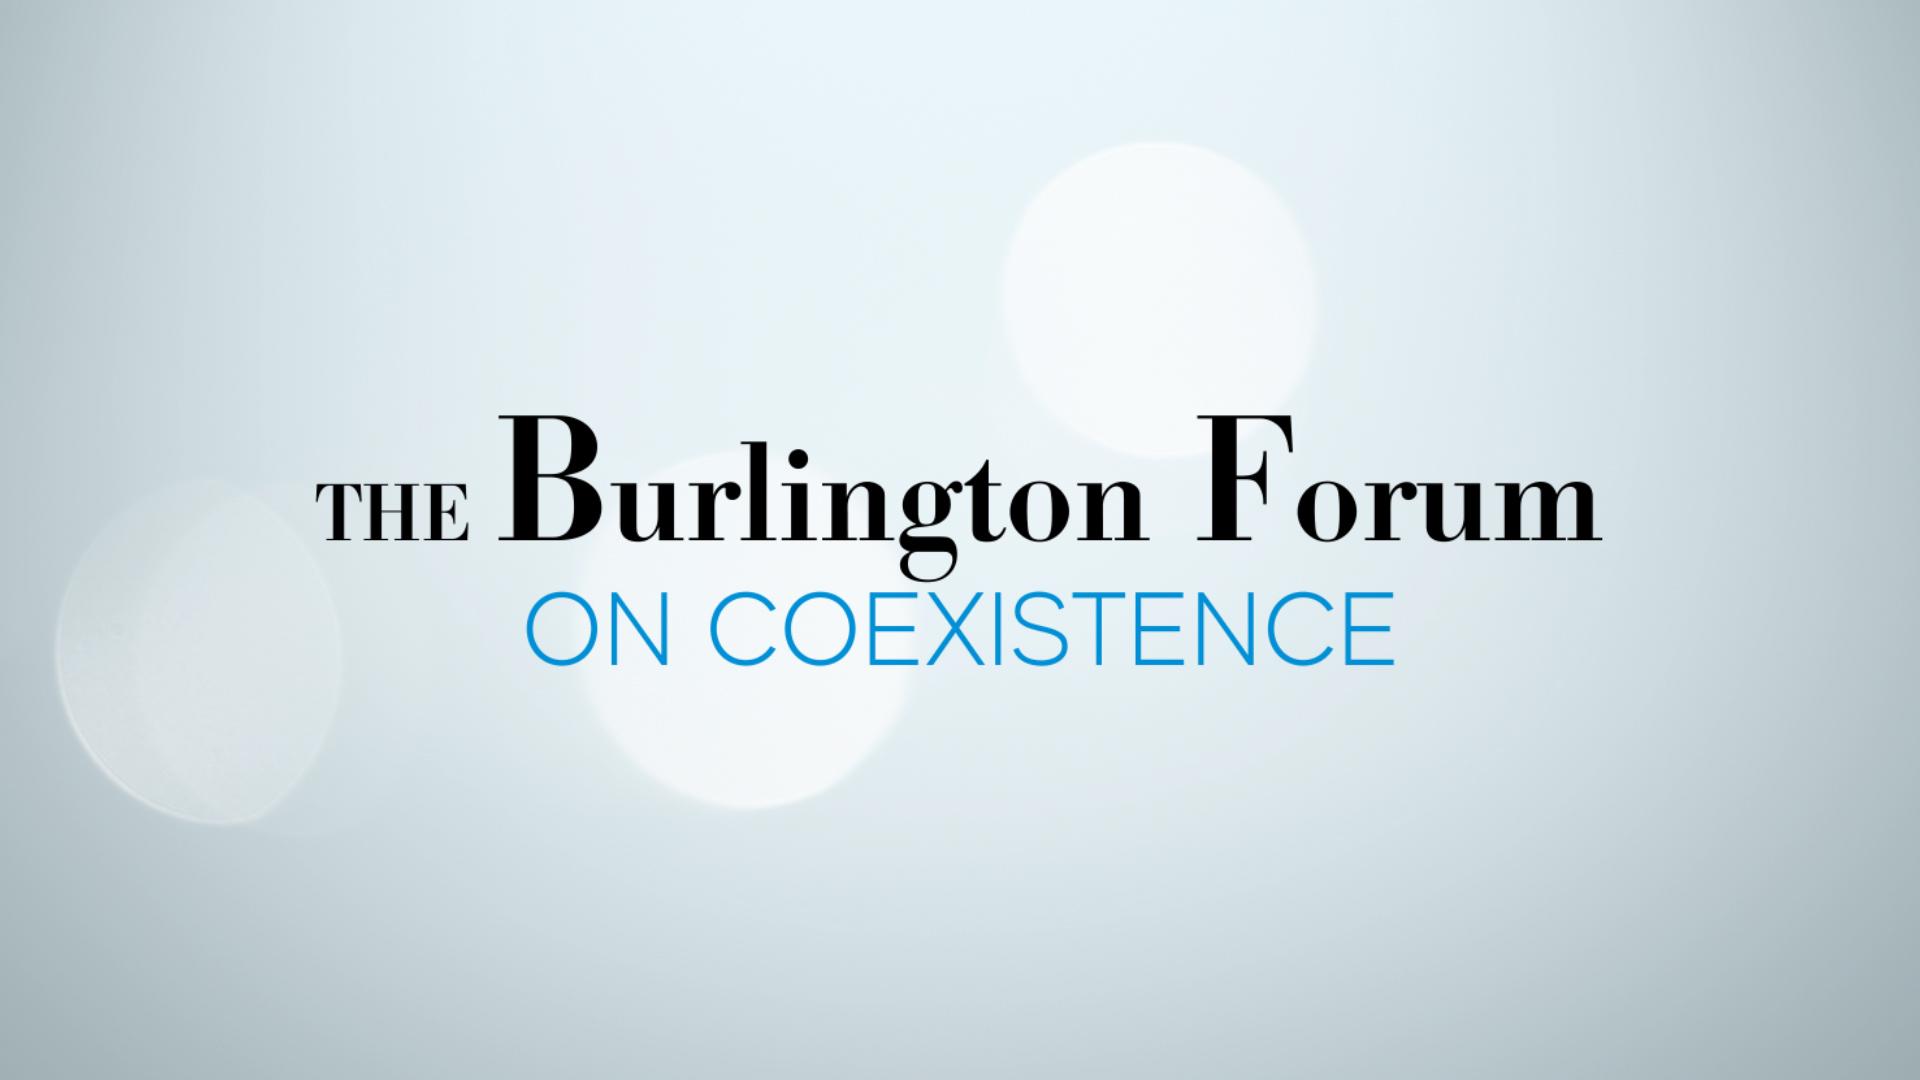 The Burlington Forum on Coexistence